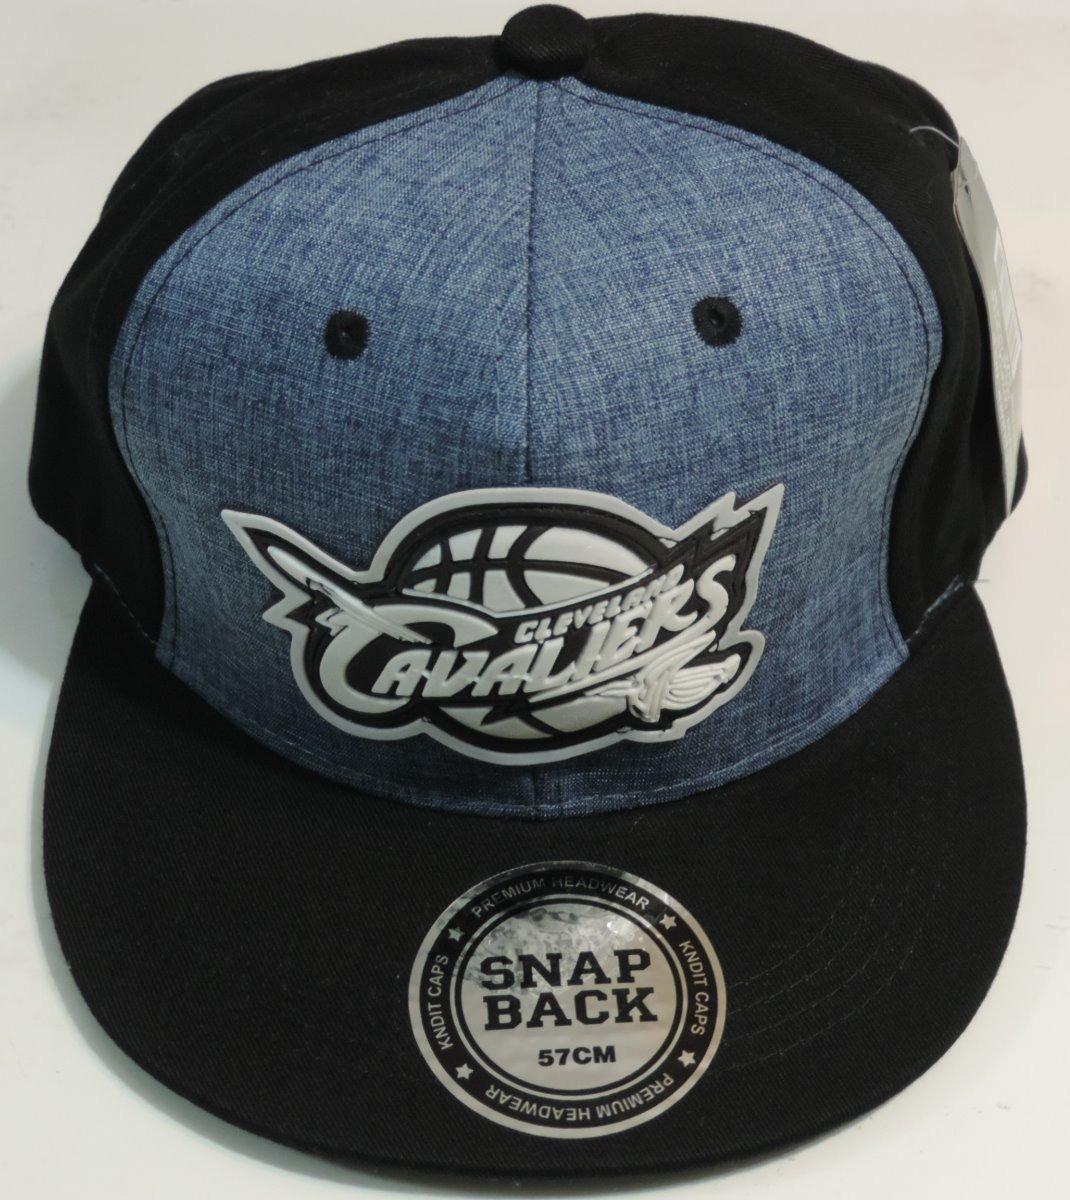 Cleveland Cavaliers Gorra Azul Logo Envio Gratis Nba Ace70 ... 8b59a053af1